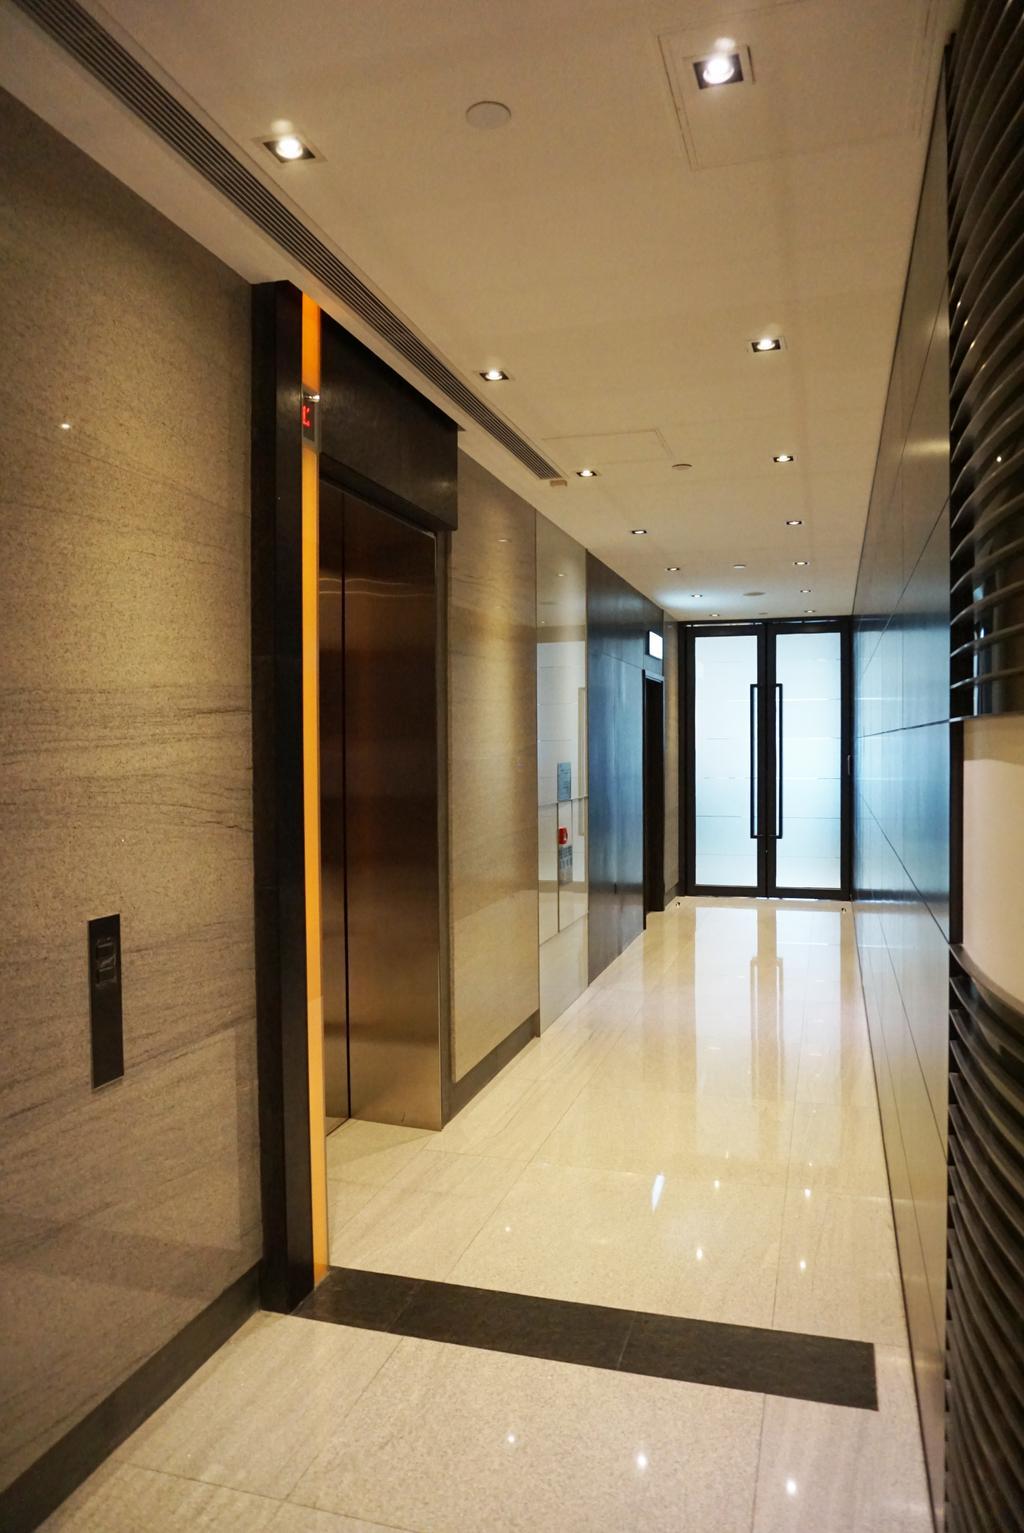 Segantii Capital, 商用, 室內設計師, AQUA Projects